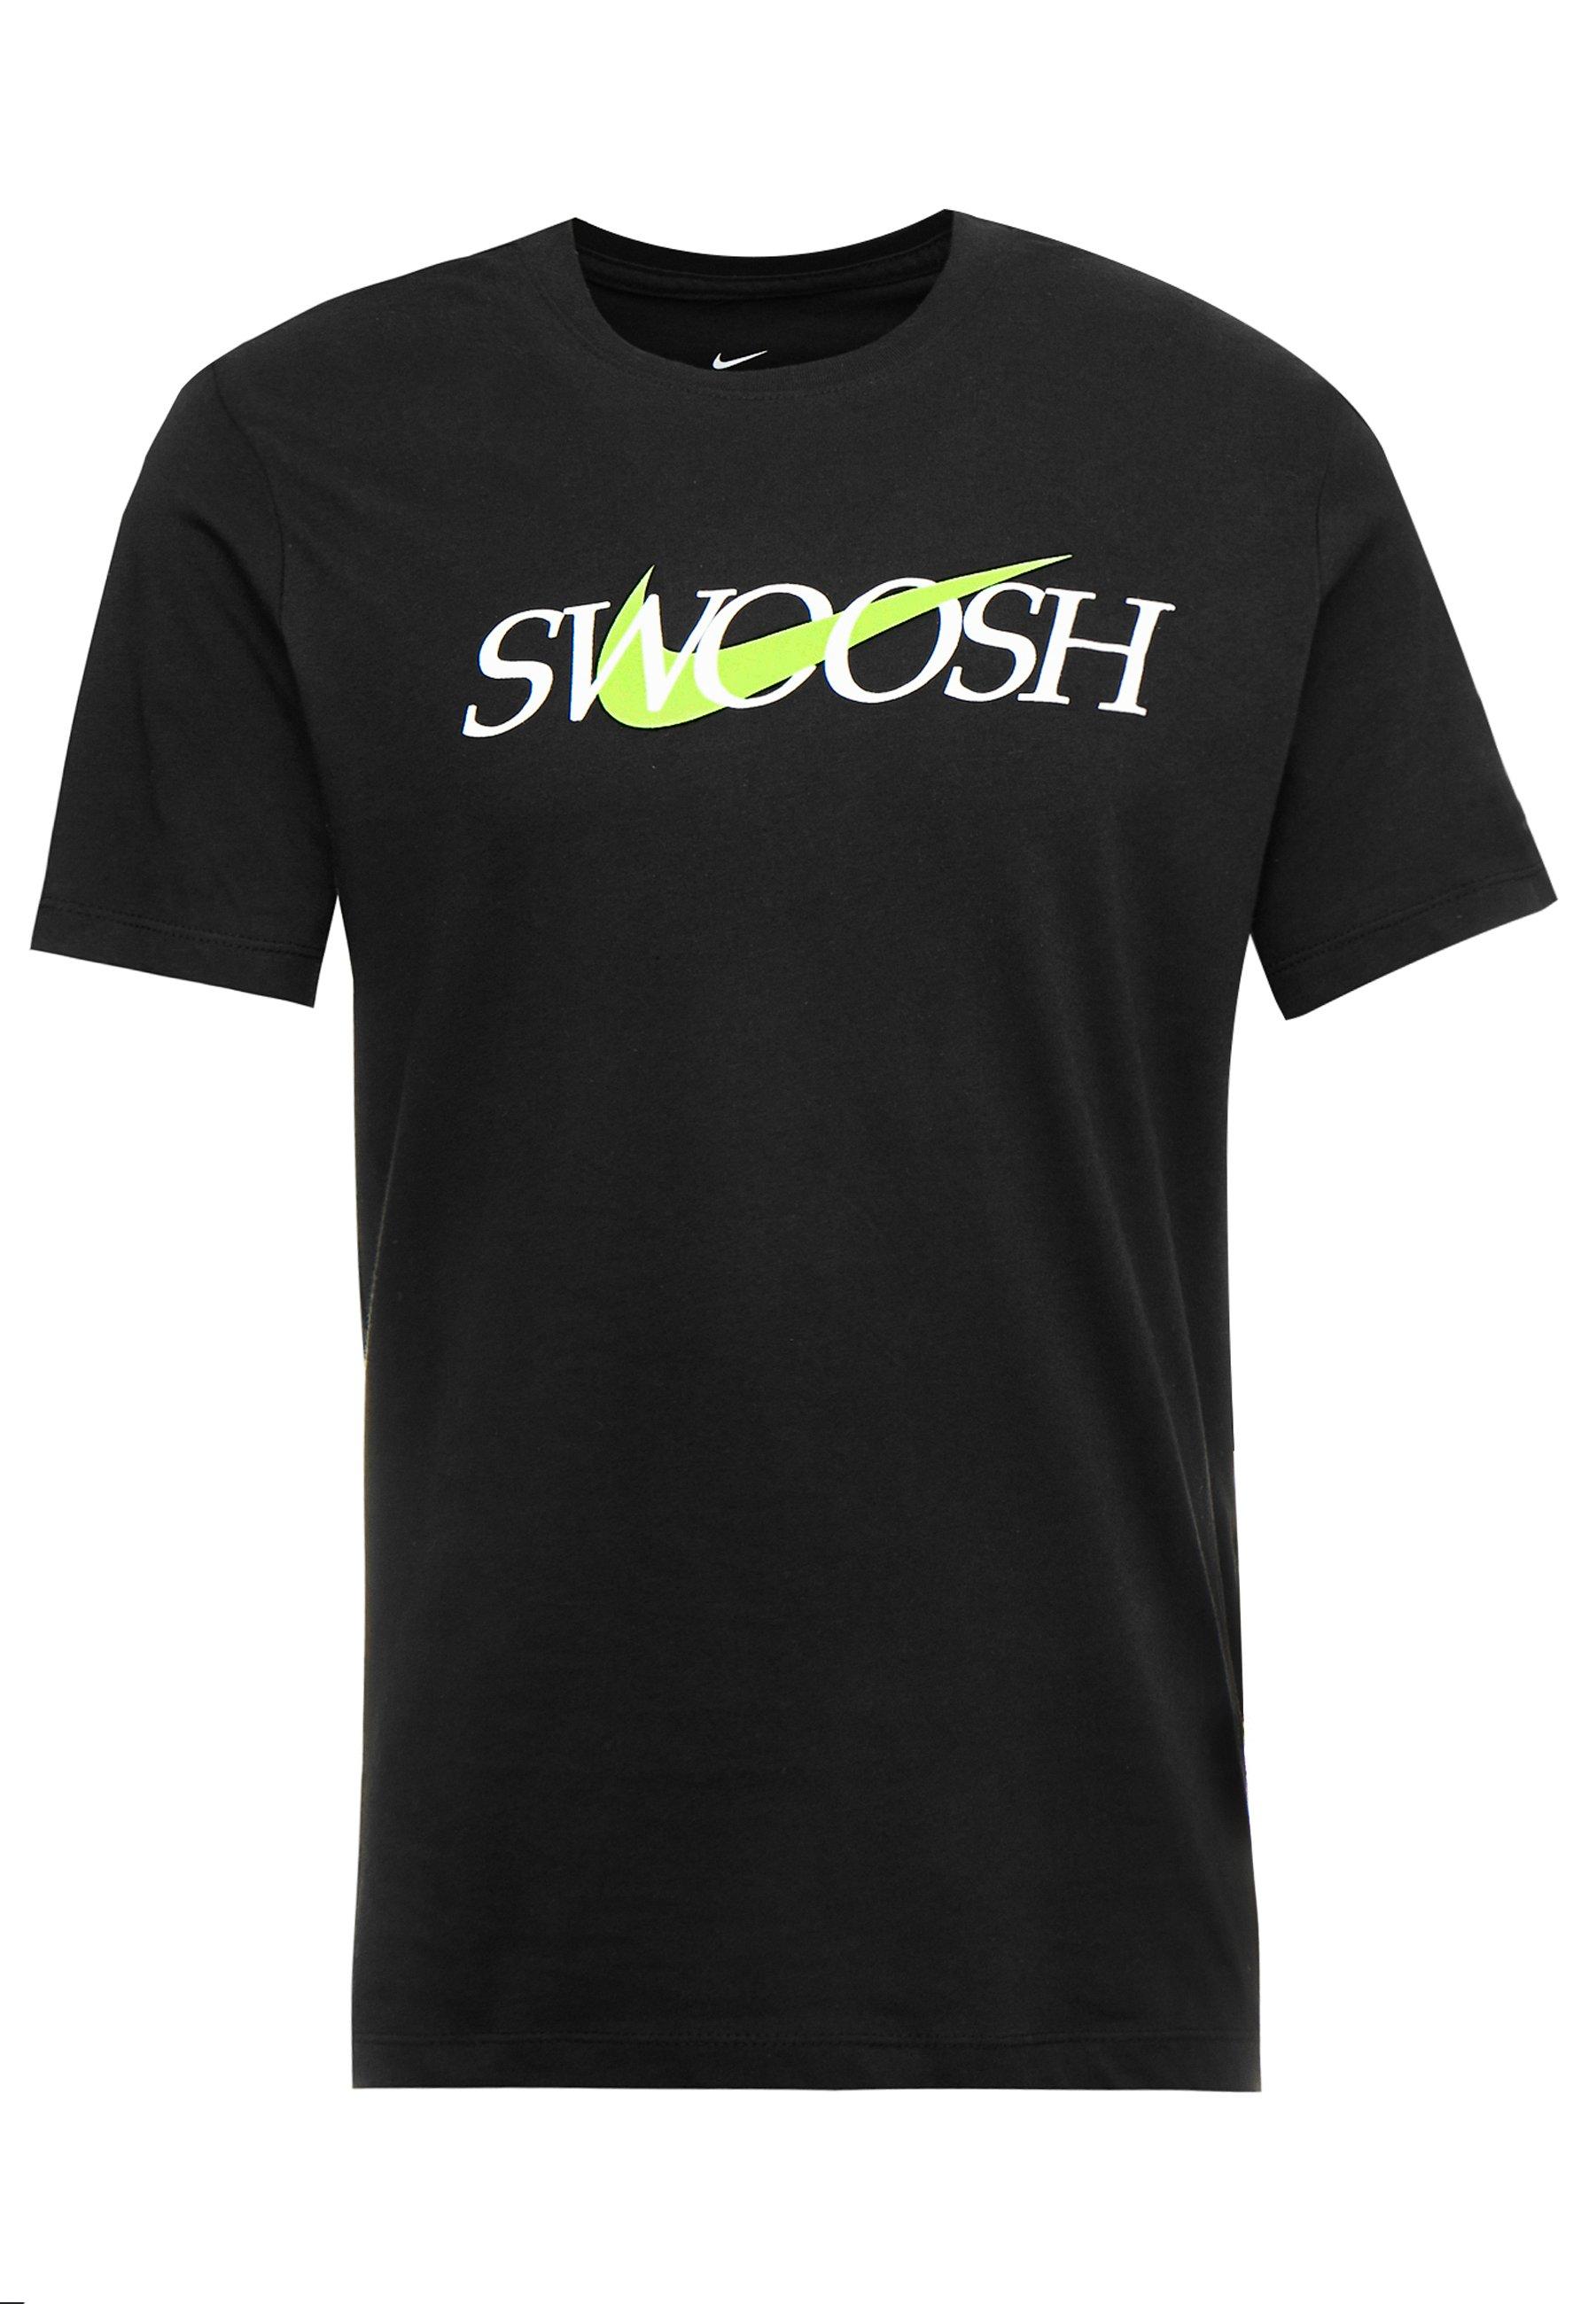 Nike Sportswear Pack Tee - T-shirt Imprimé Black